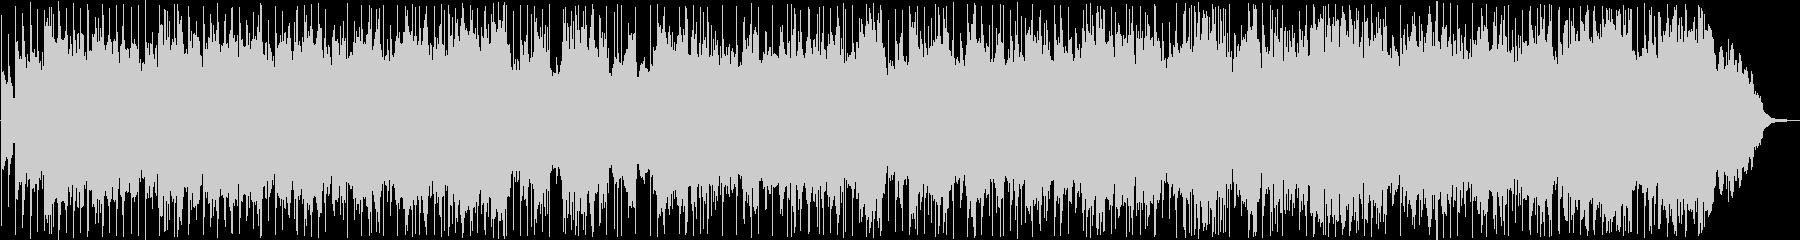 Nakunini / Okinawan folk song's unreproduced waveform